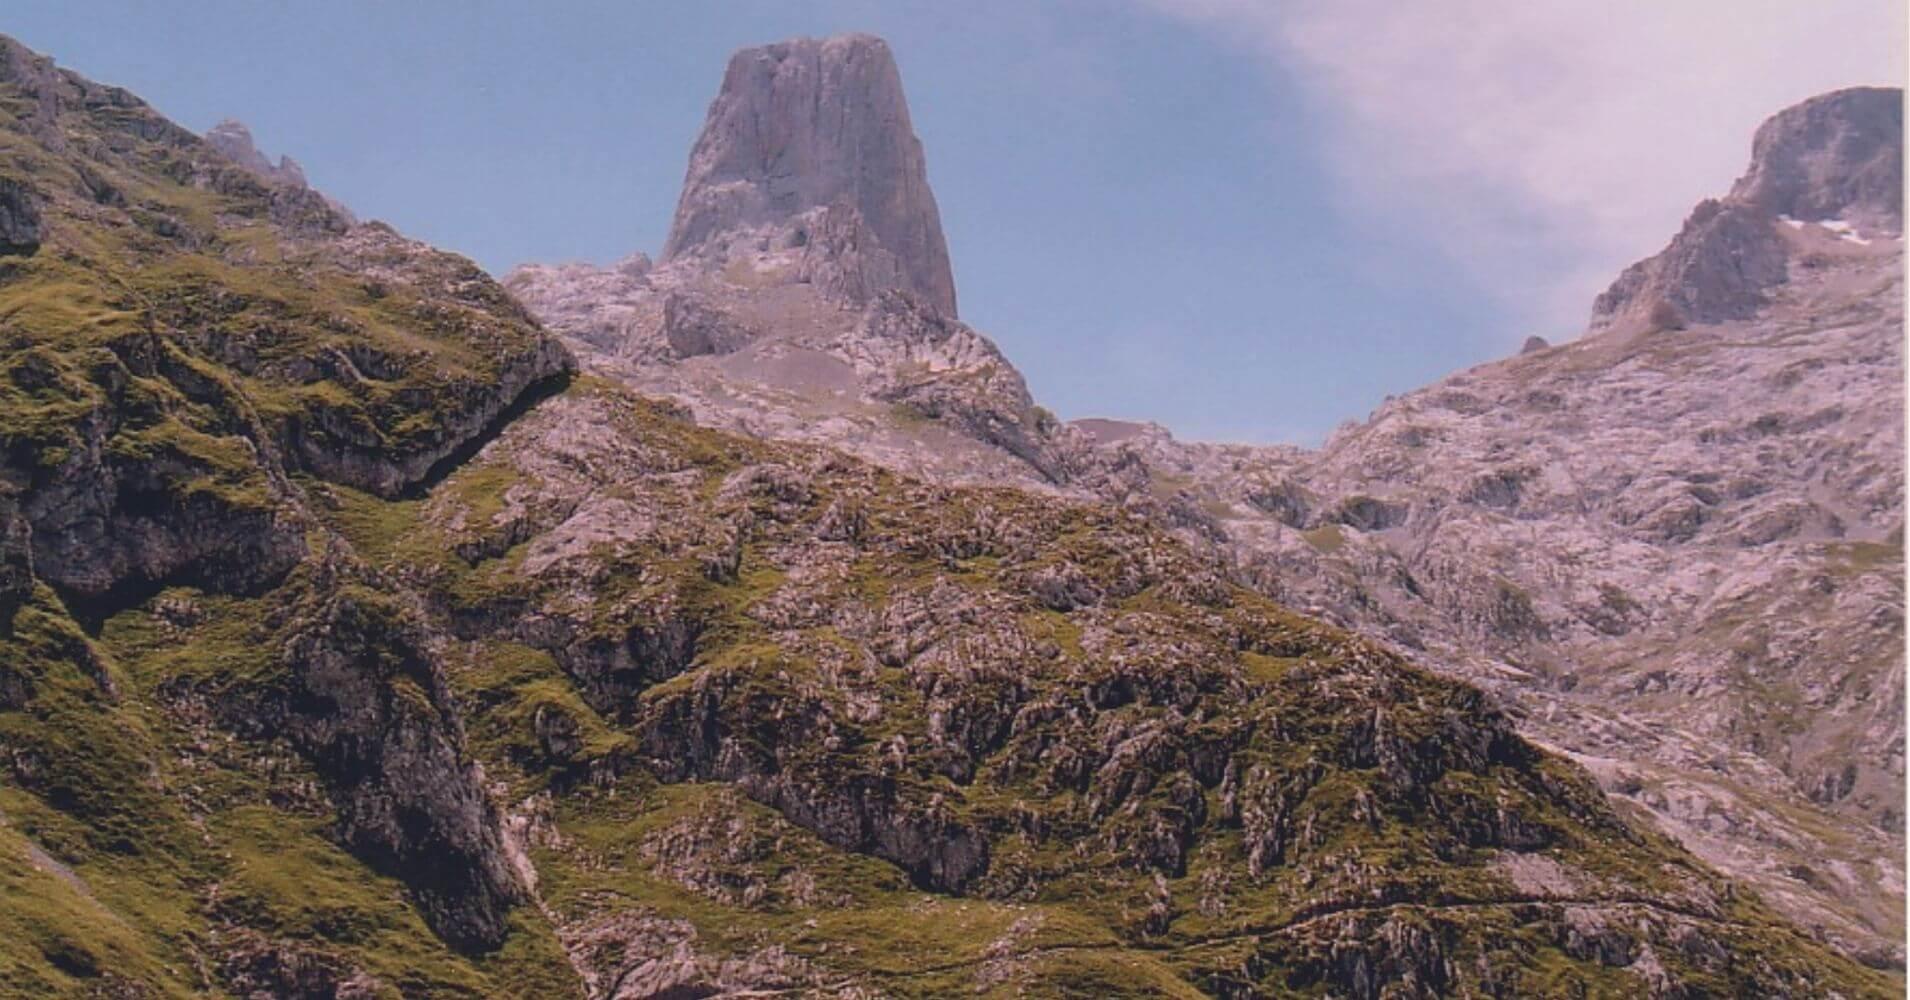 Panorámica del Naranjo de Bulnes. Pico Urriellu, Asturias.